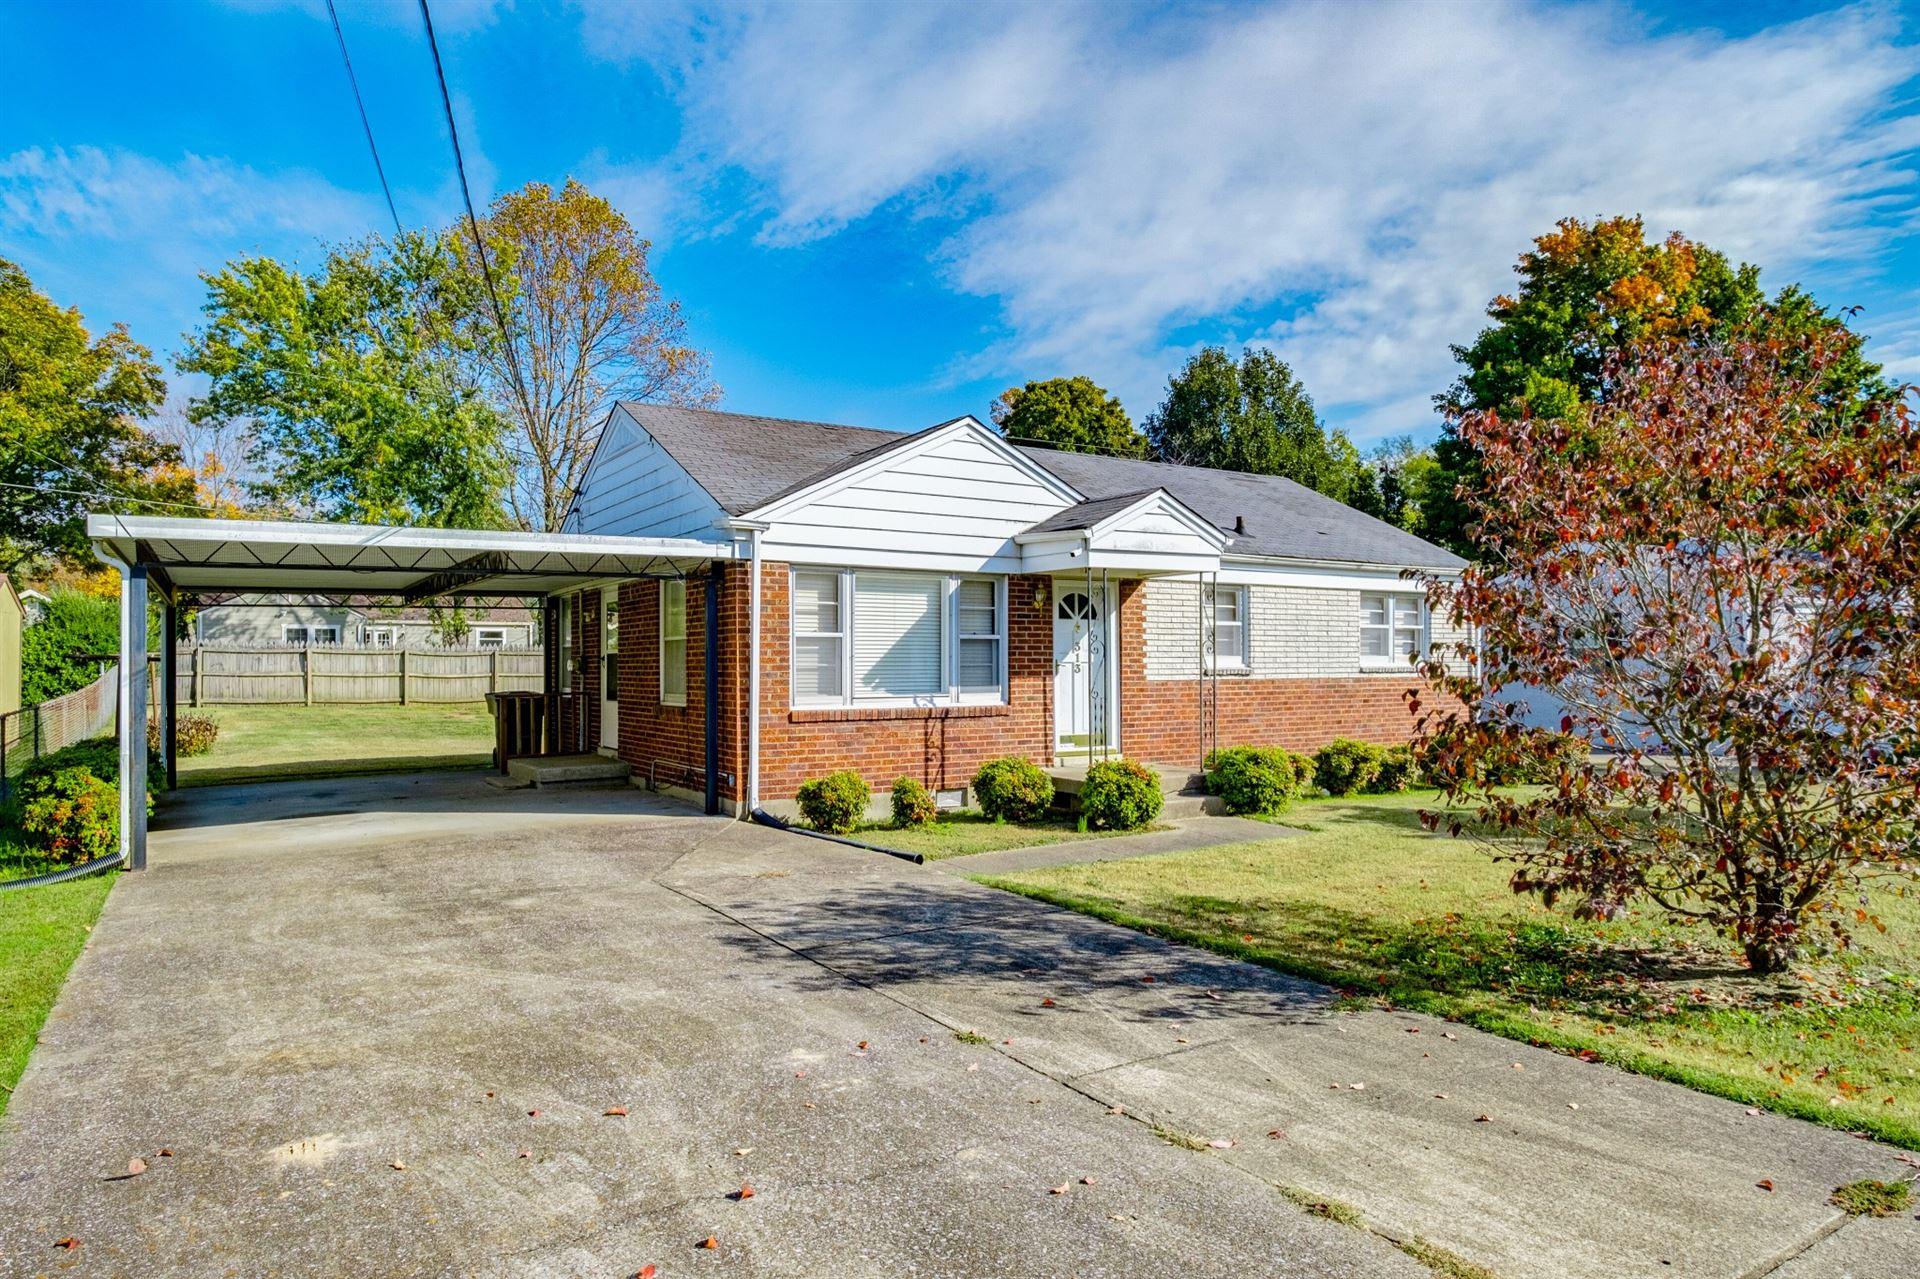 313 James Ave, Franklin, TN 37064 - MLS#: 2202017